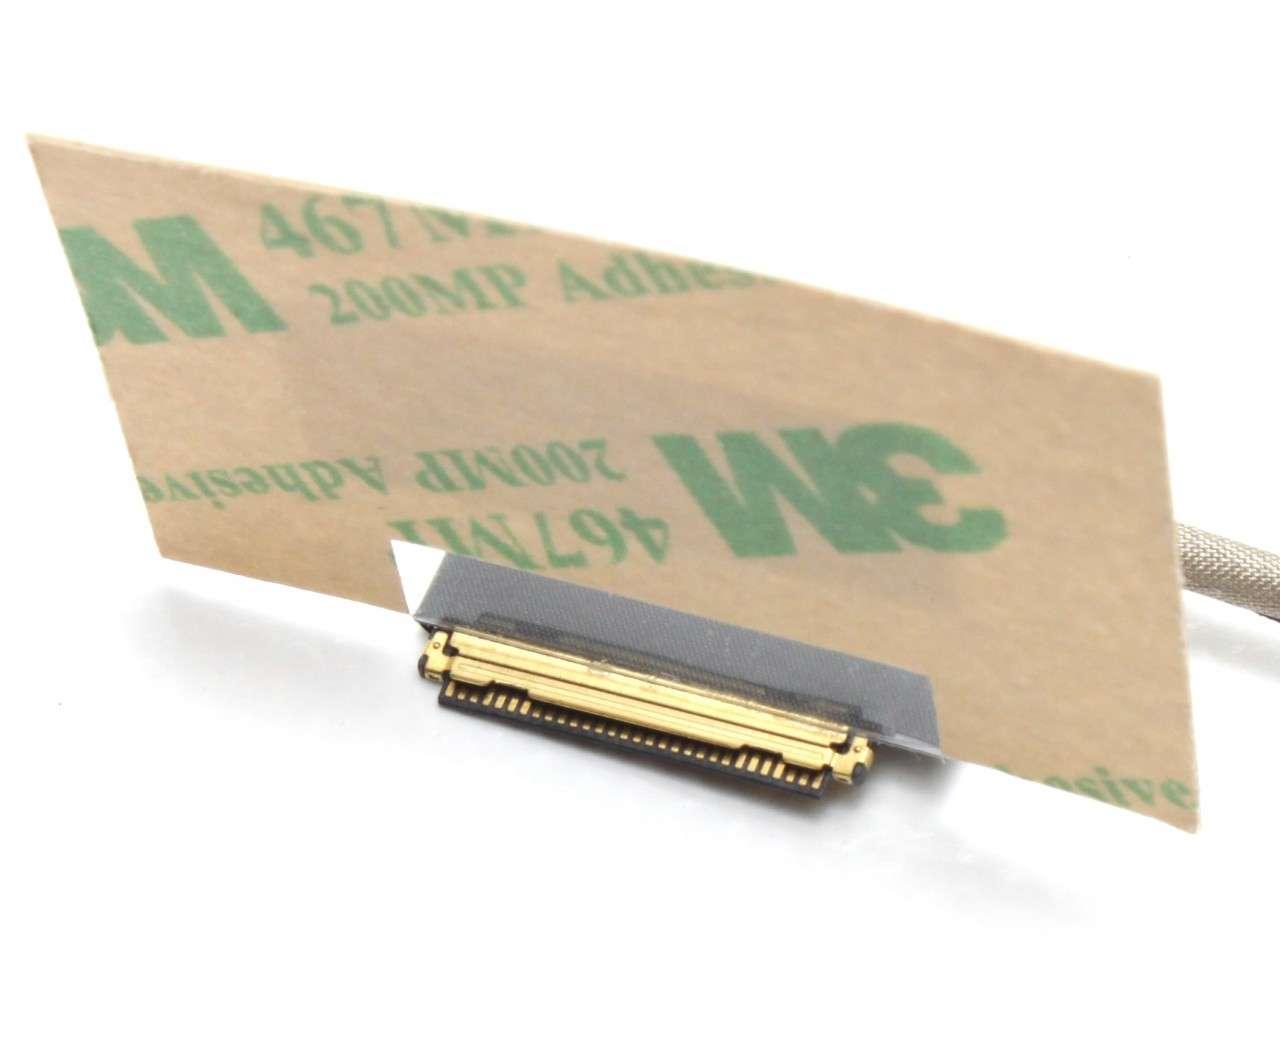 Cablu video Edp Lenovo IdeaPad 320S-15IKBR imagine powerlaptop.ro 2021